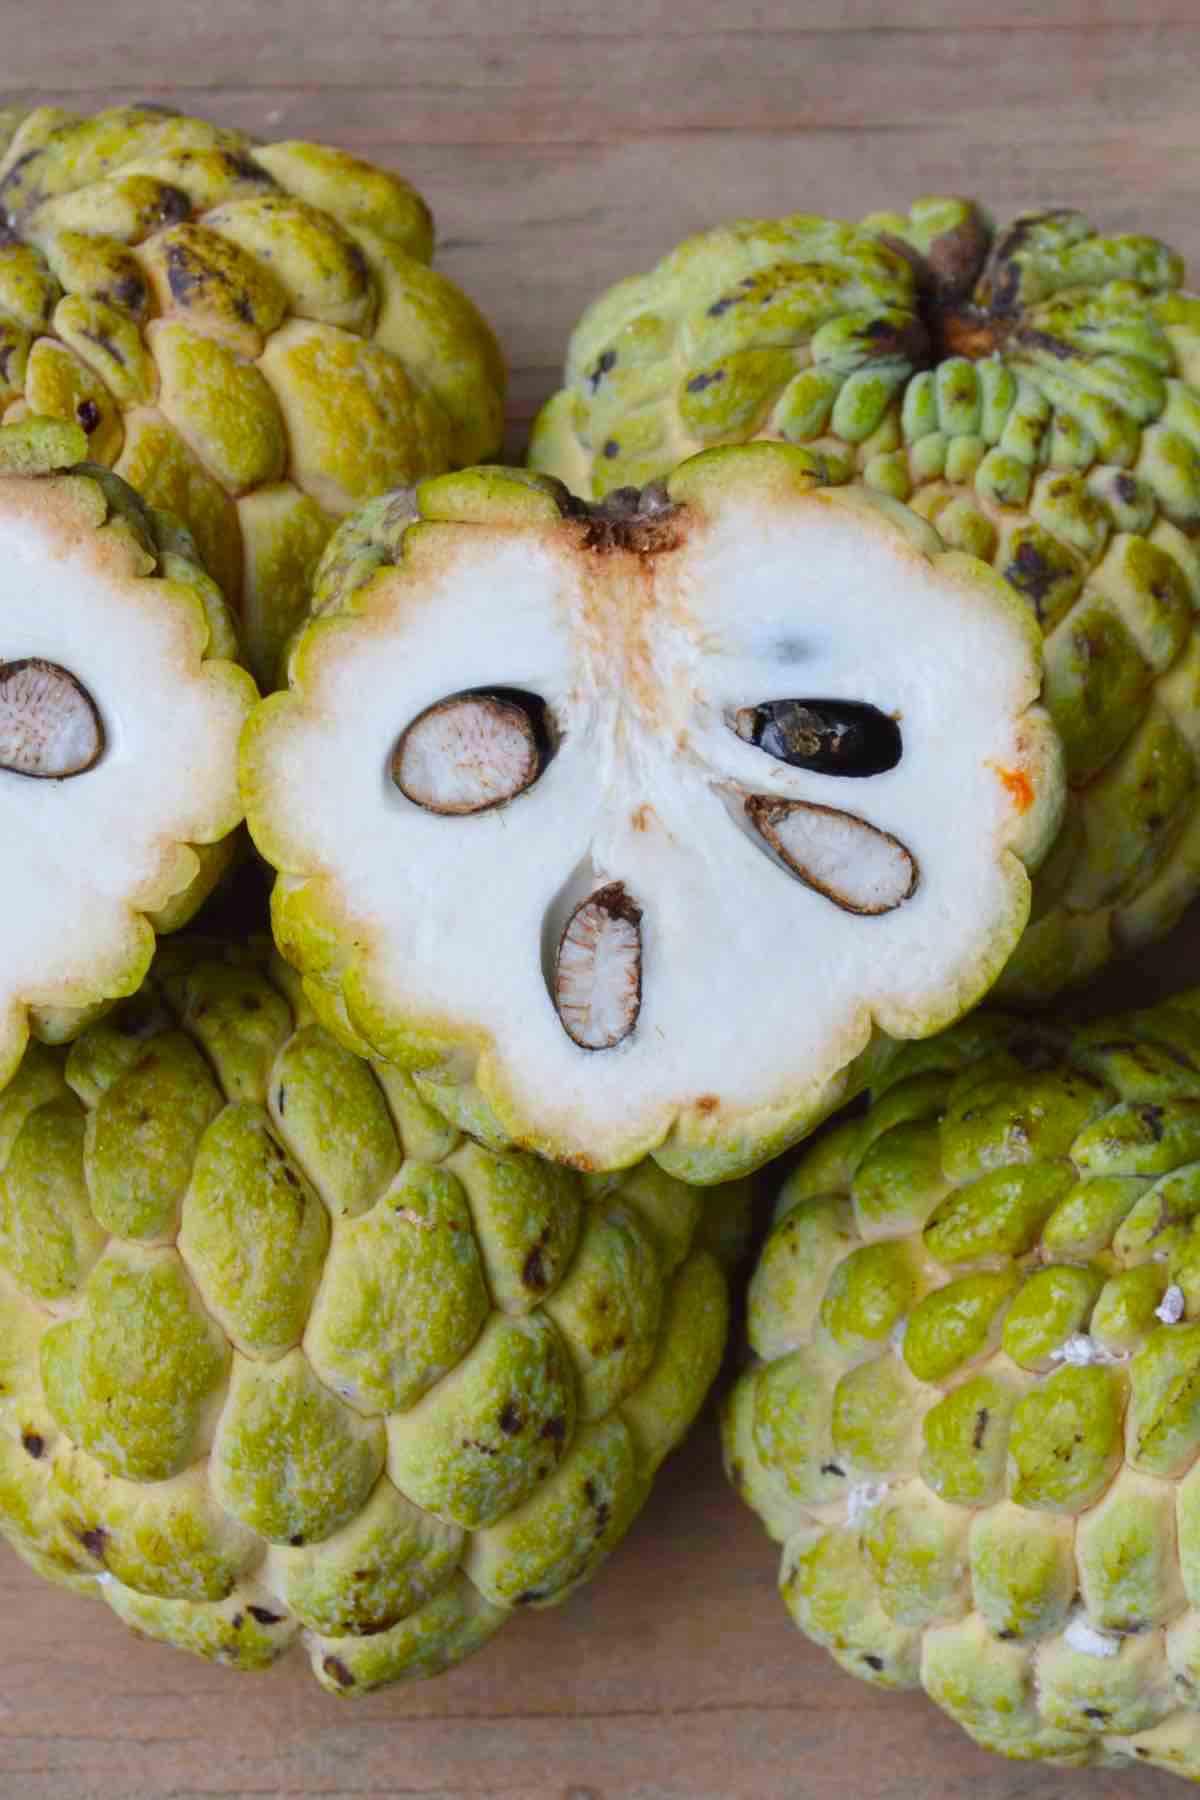 Cross-section of ripe sugar apples